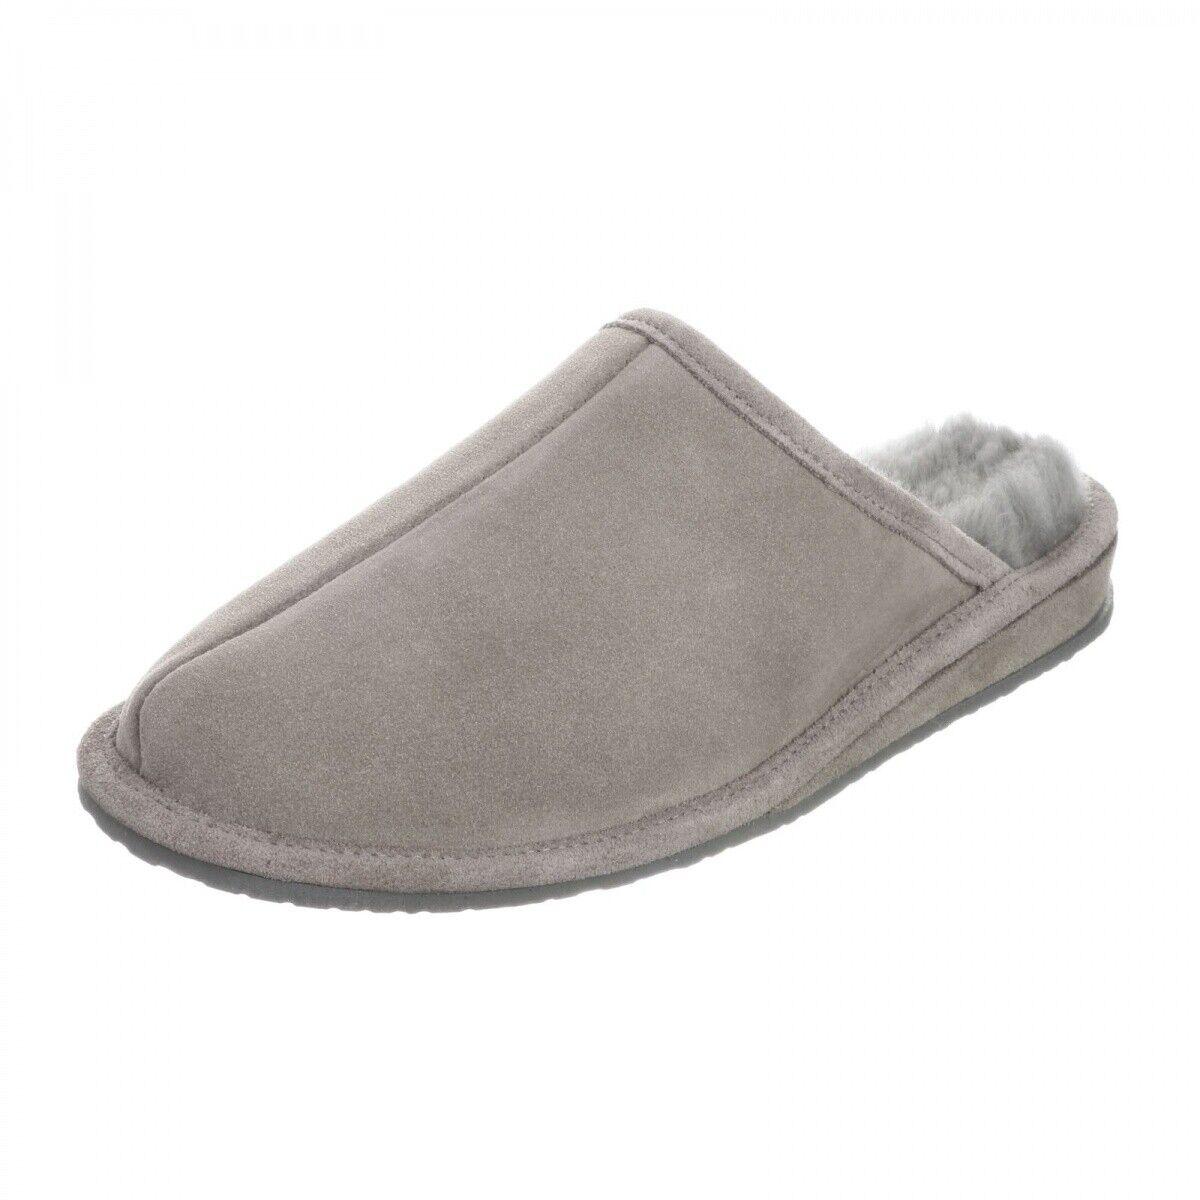 Men/'s Brown Soft Sheepskin Lambskin Fur Slippers KATZ Leather Warm Size 8 NEW